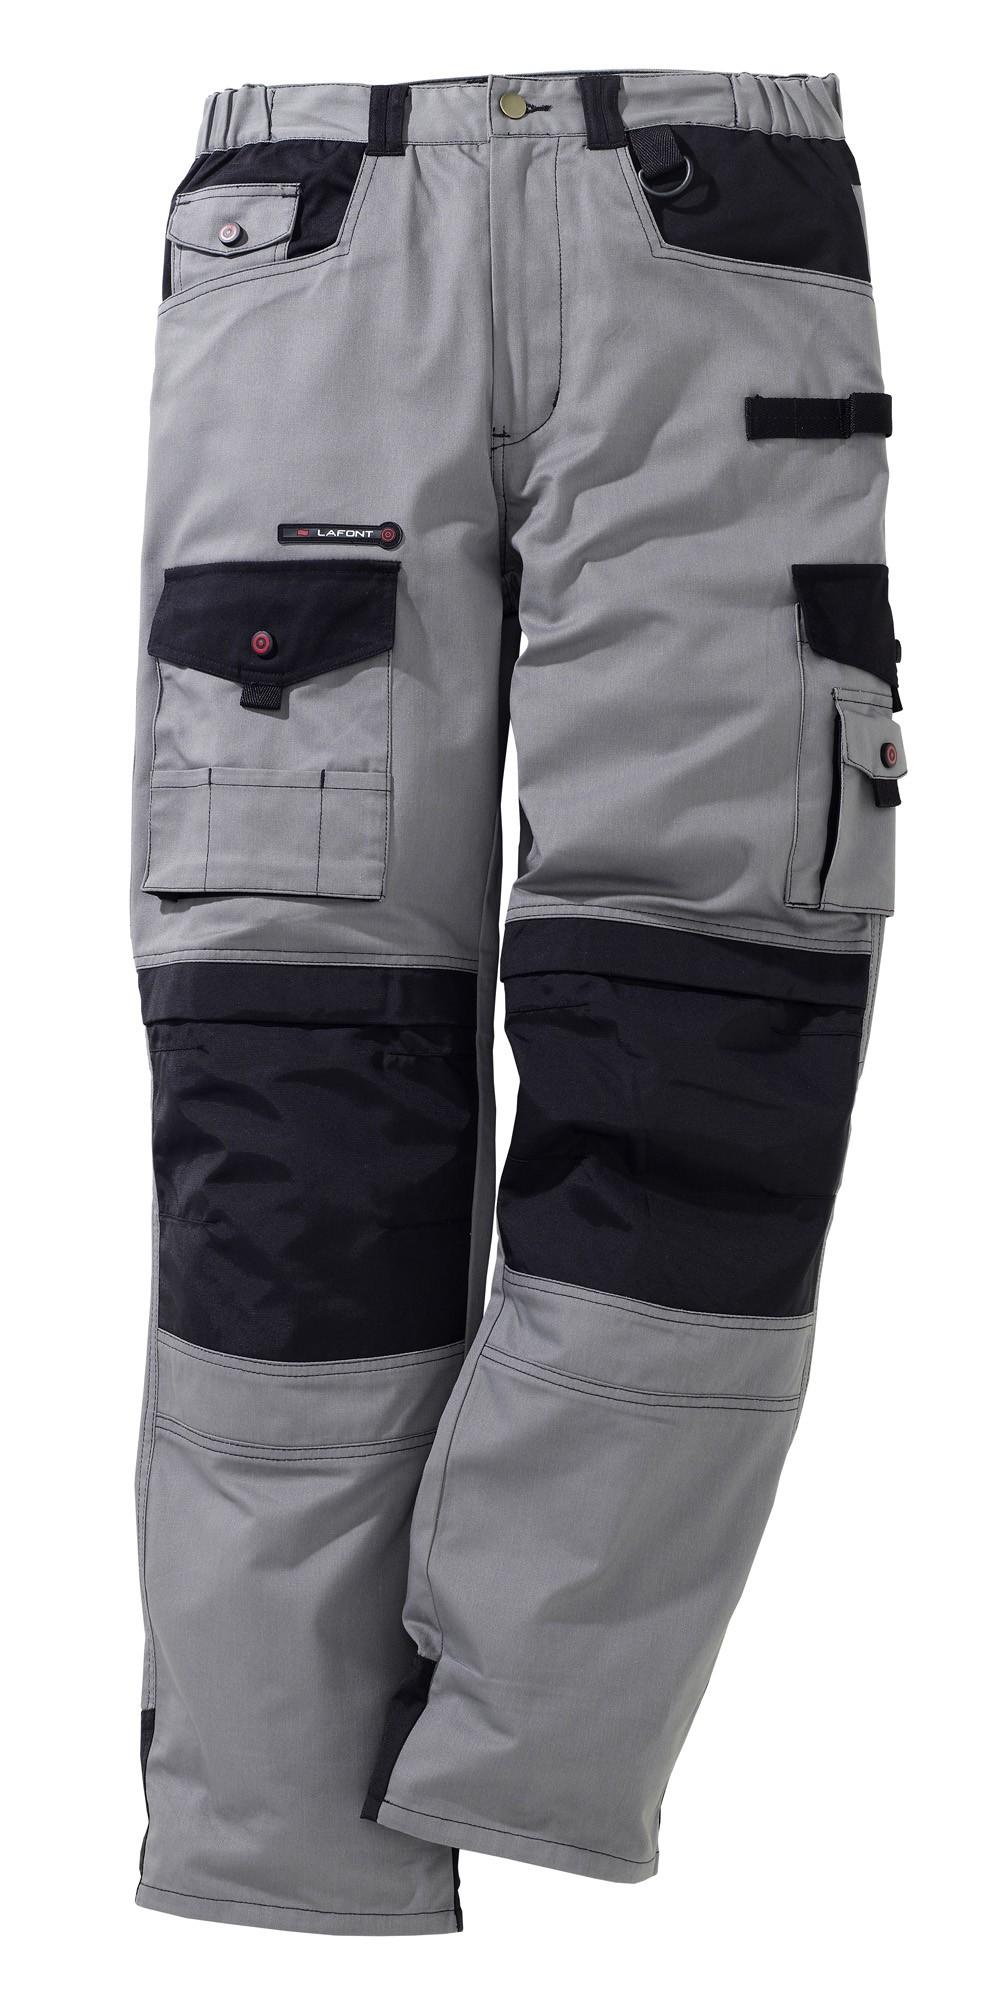 pantalon work attitude gris noir 785. Black Bedroom Furniture Sets. Home Design Ideas